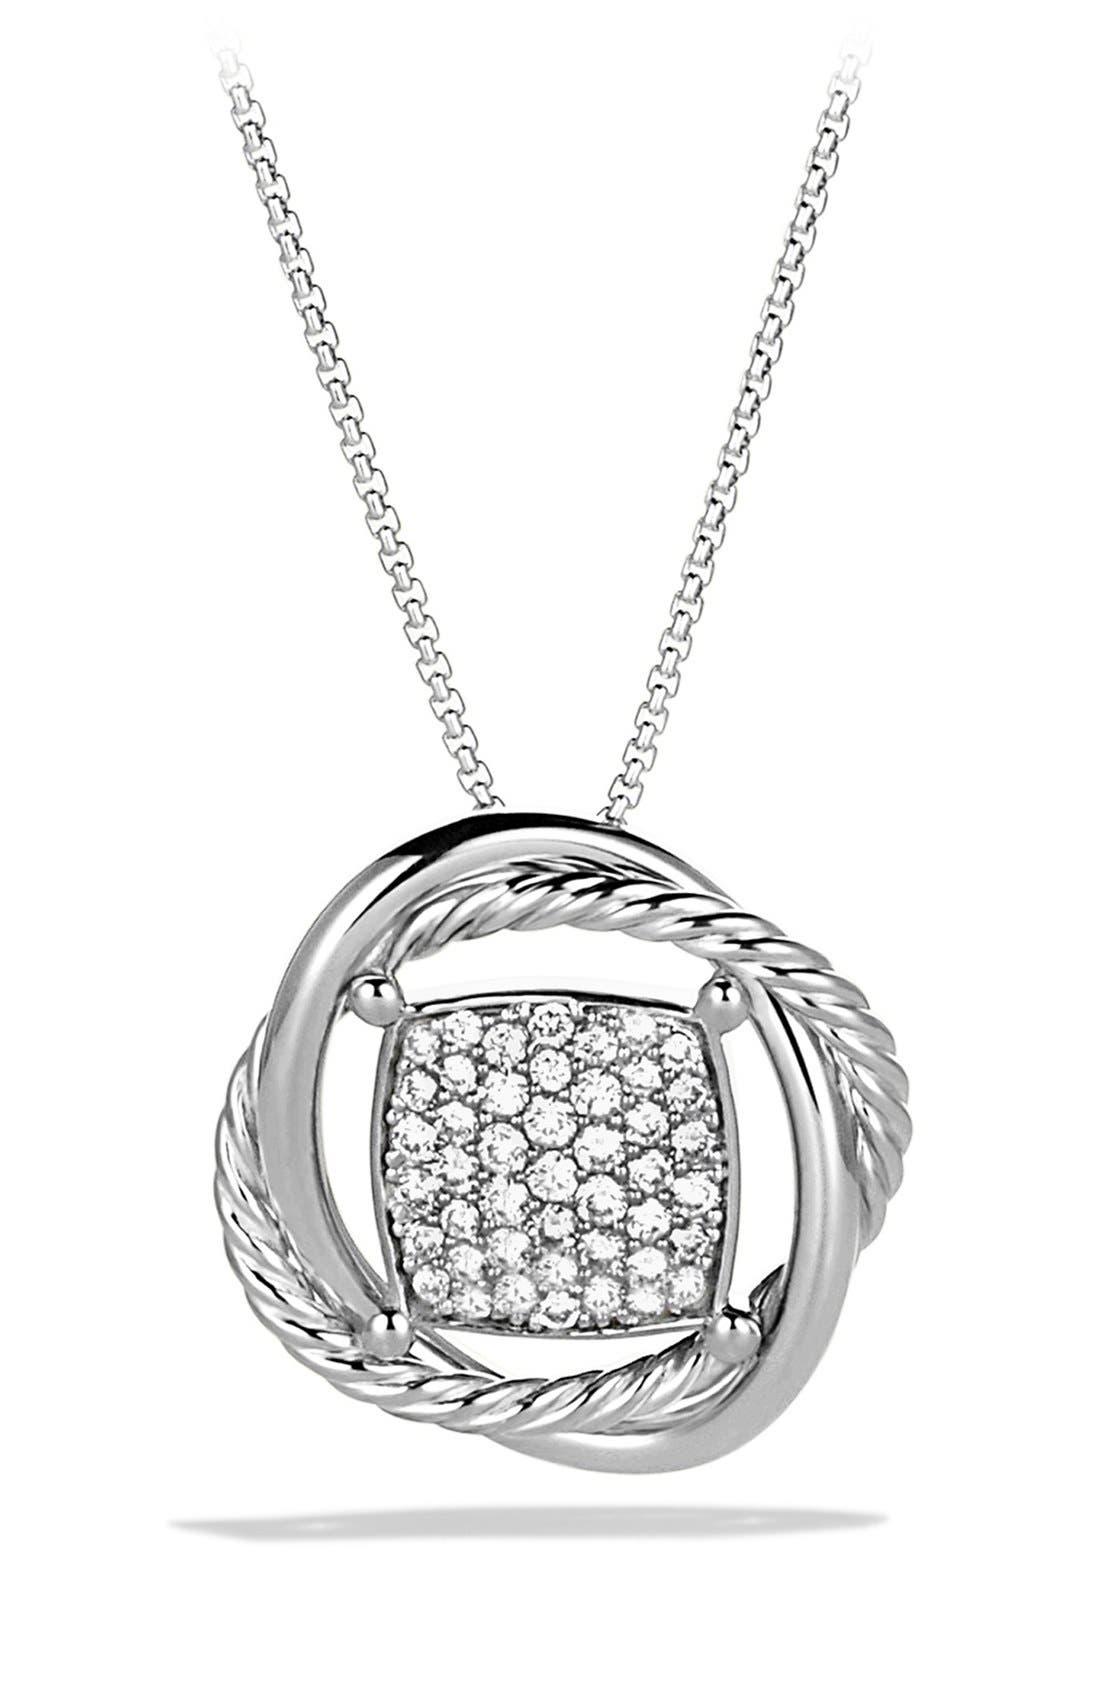 DAVID YURMAN Infinity Pendant with Diamonds on Chain